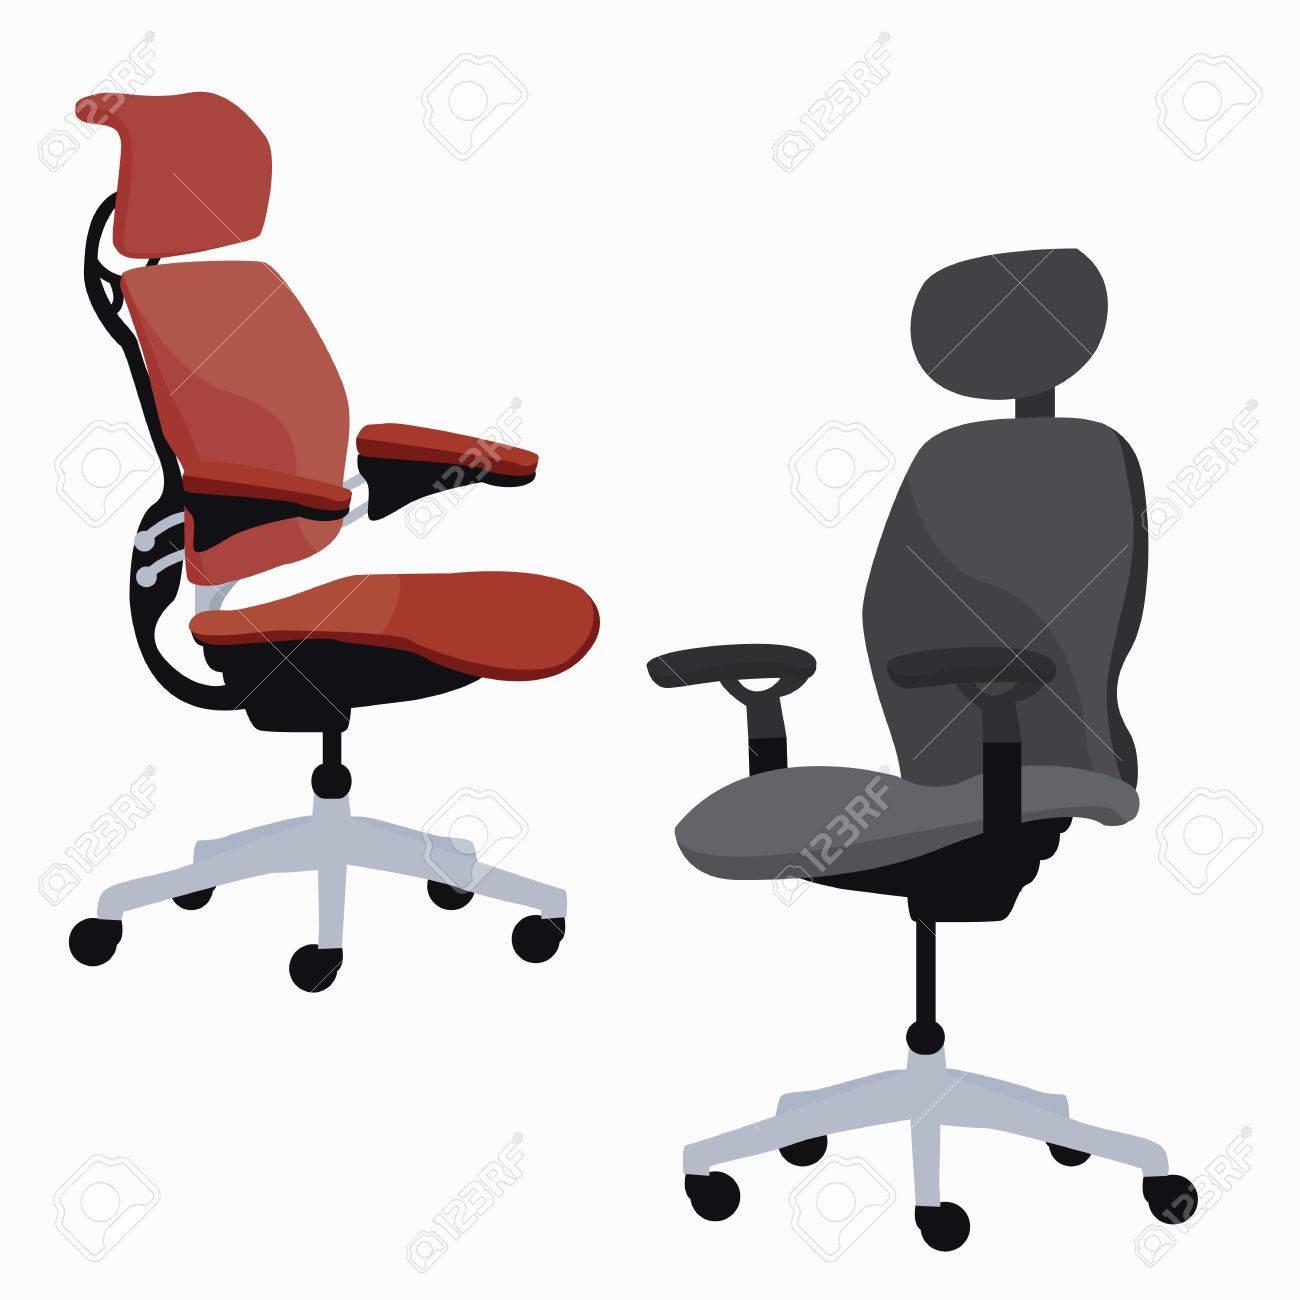 Ergonomischer Stuhl Büromöbel Verstellbare Sessel Vektor Lizenzfrei